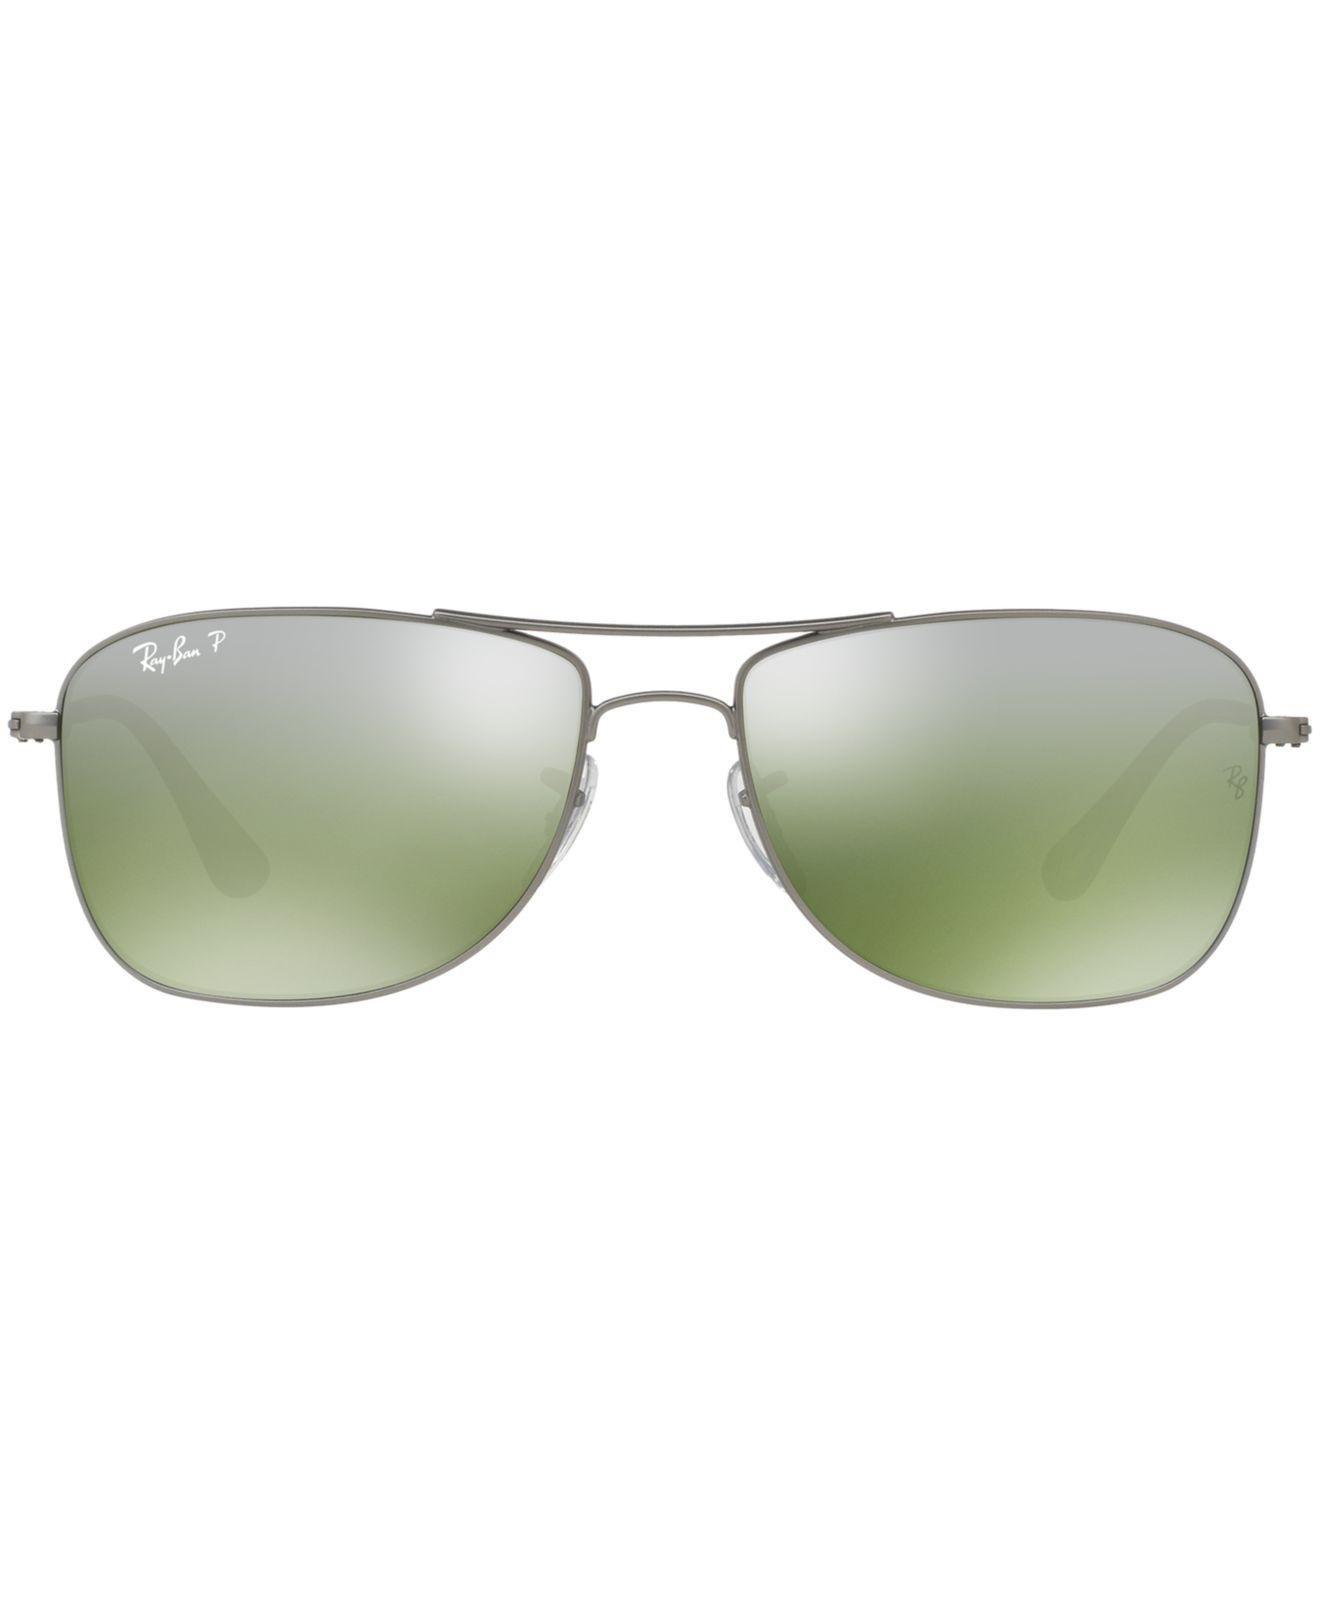 ccd3921d906 Lyst - Ray-Ban Sunglasses